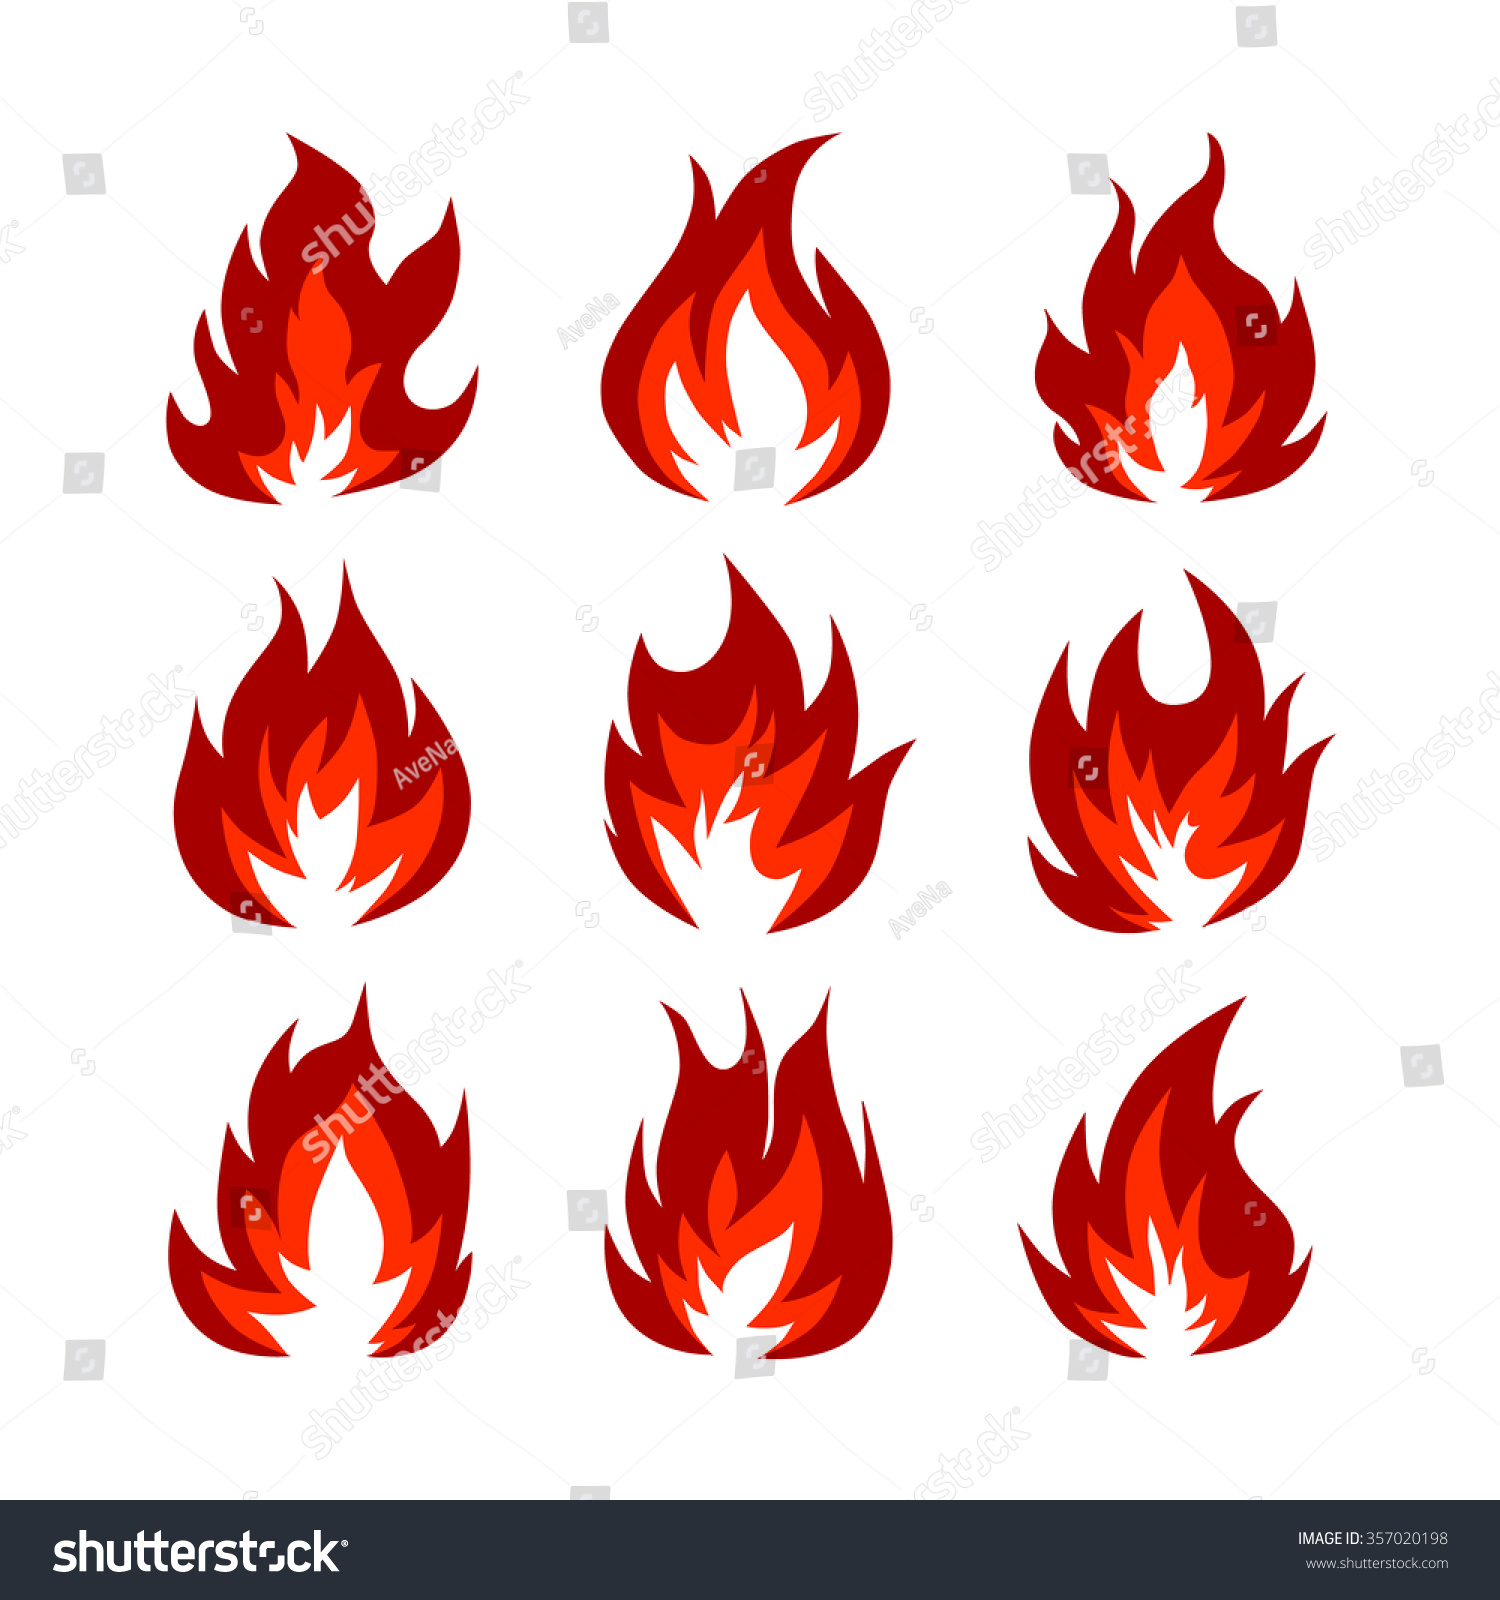 symbolism of fire